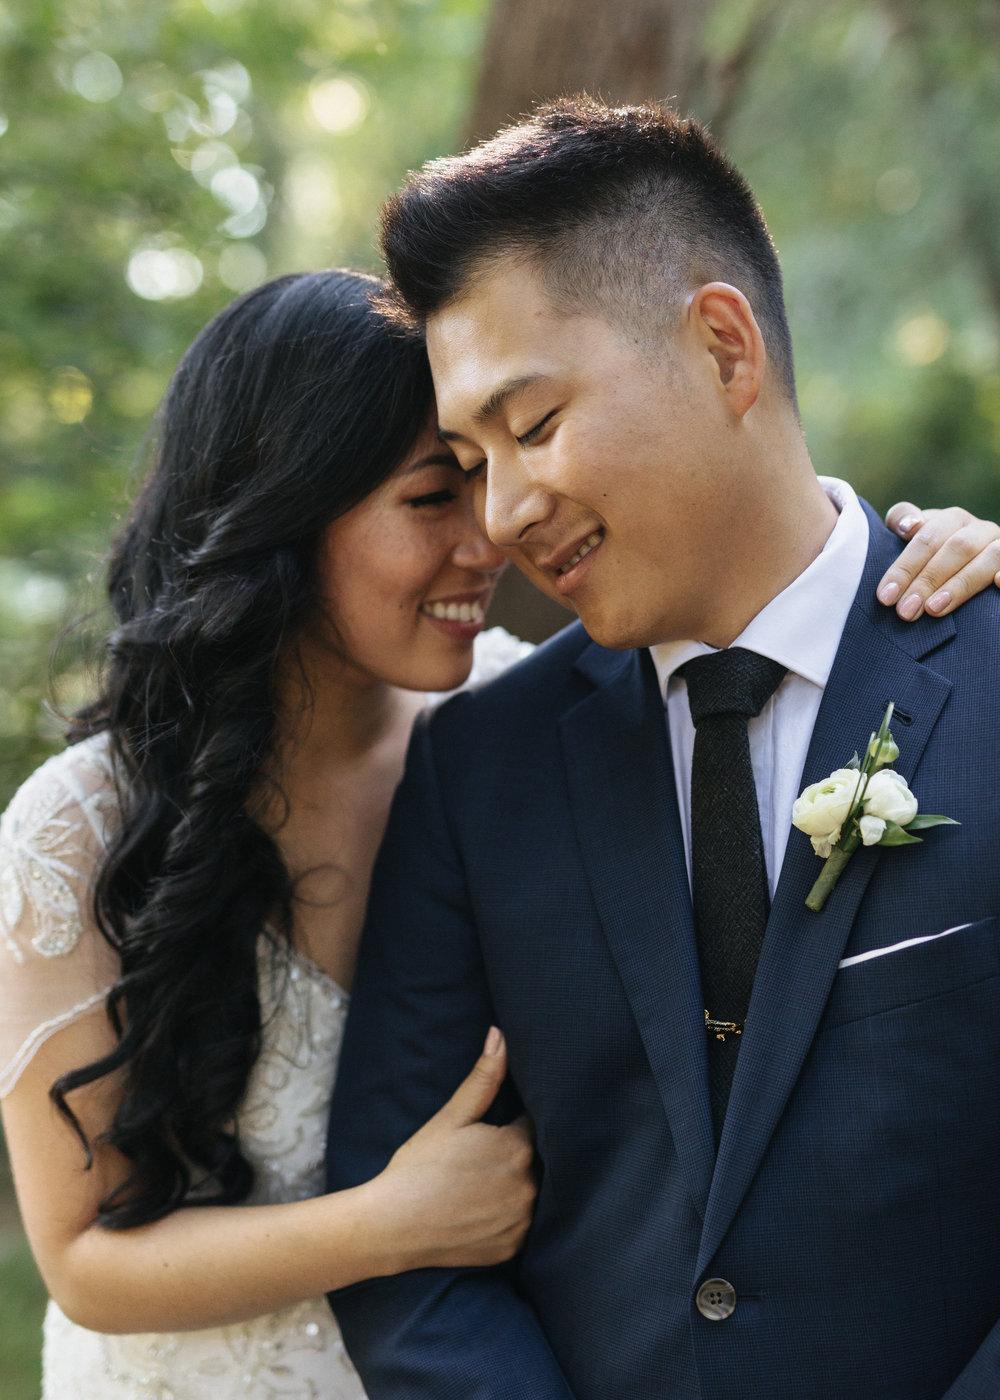 herastudios_wedding_tracy_kyley_hera_selects-69.jpg